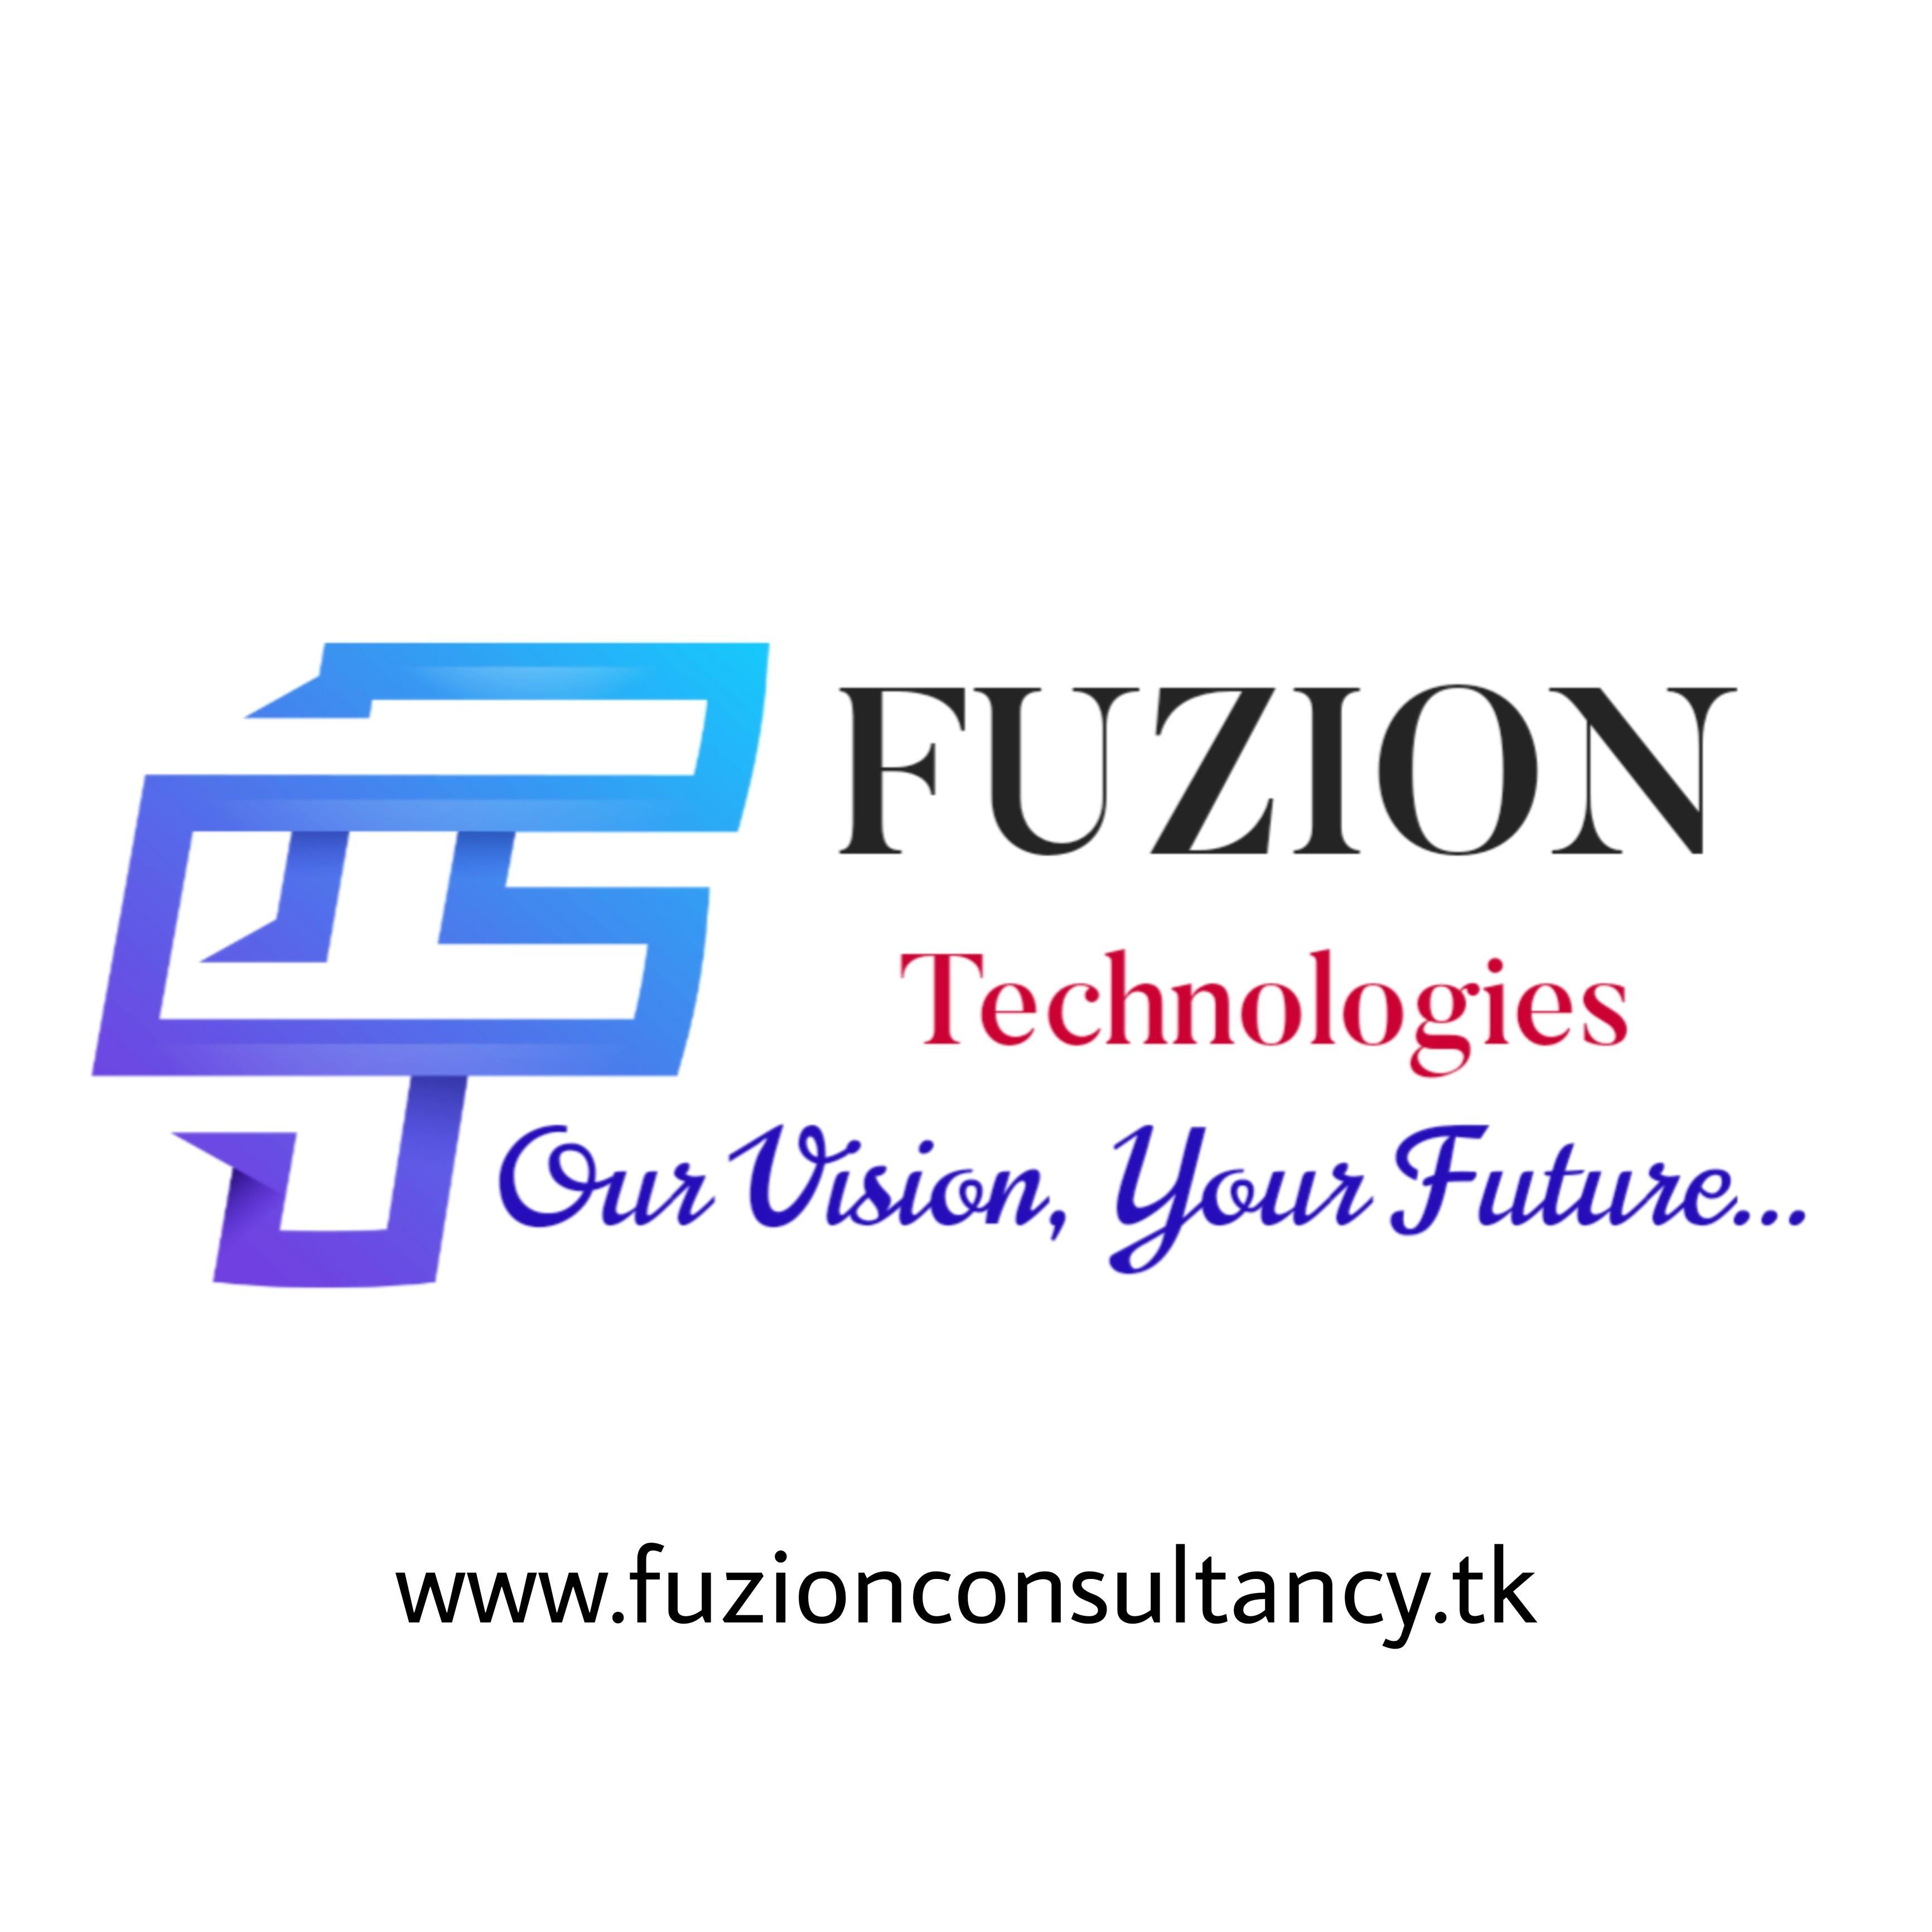 Fuzion Technologies